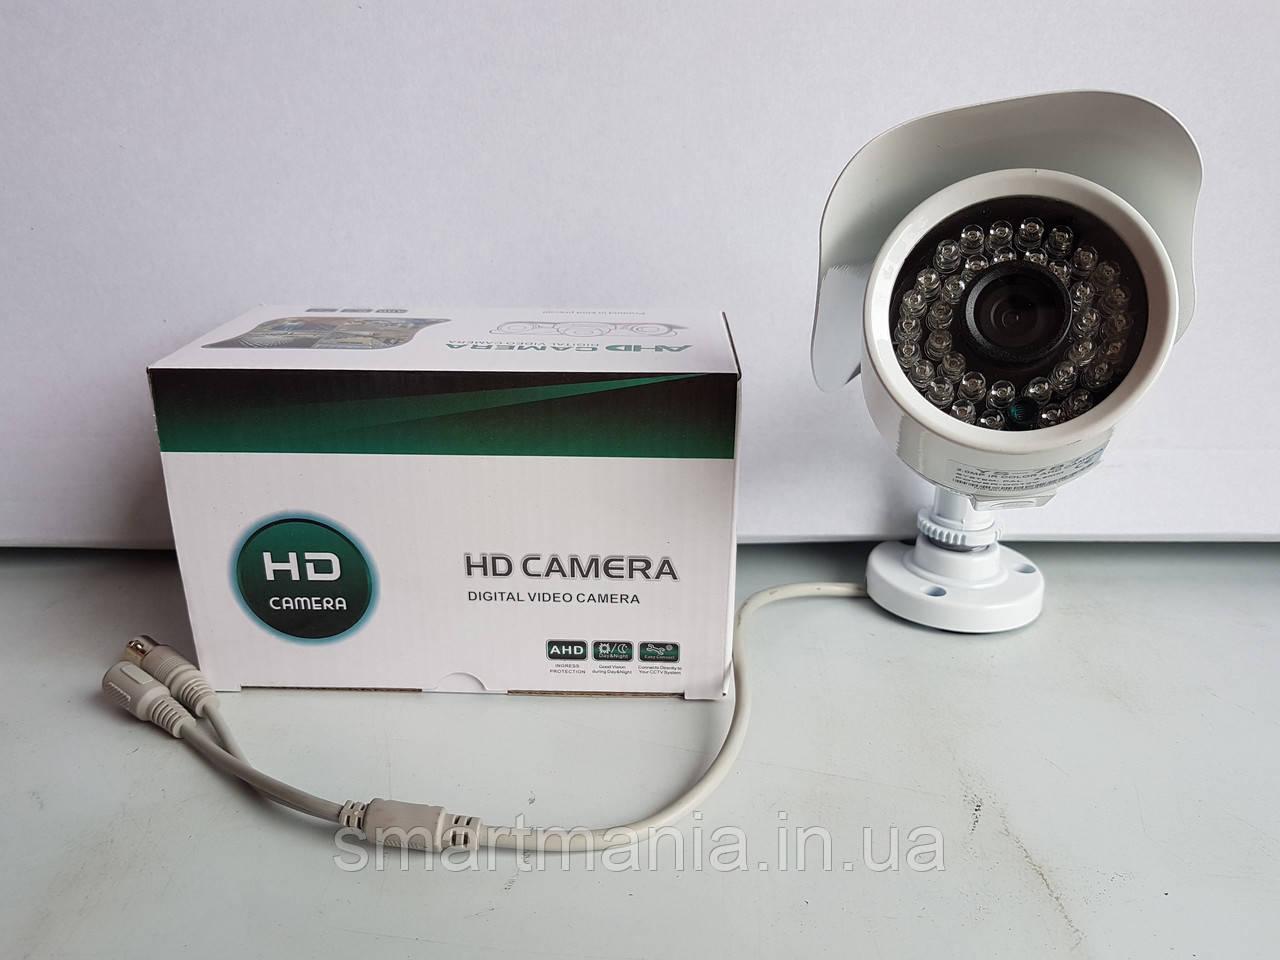 Наружняя камера видеонаблюдения YS-787 (2MP-3,6mm)